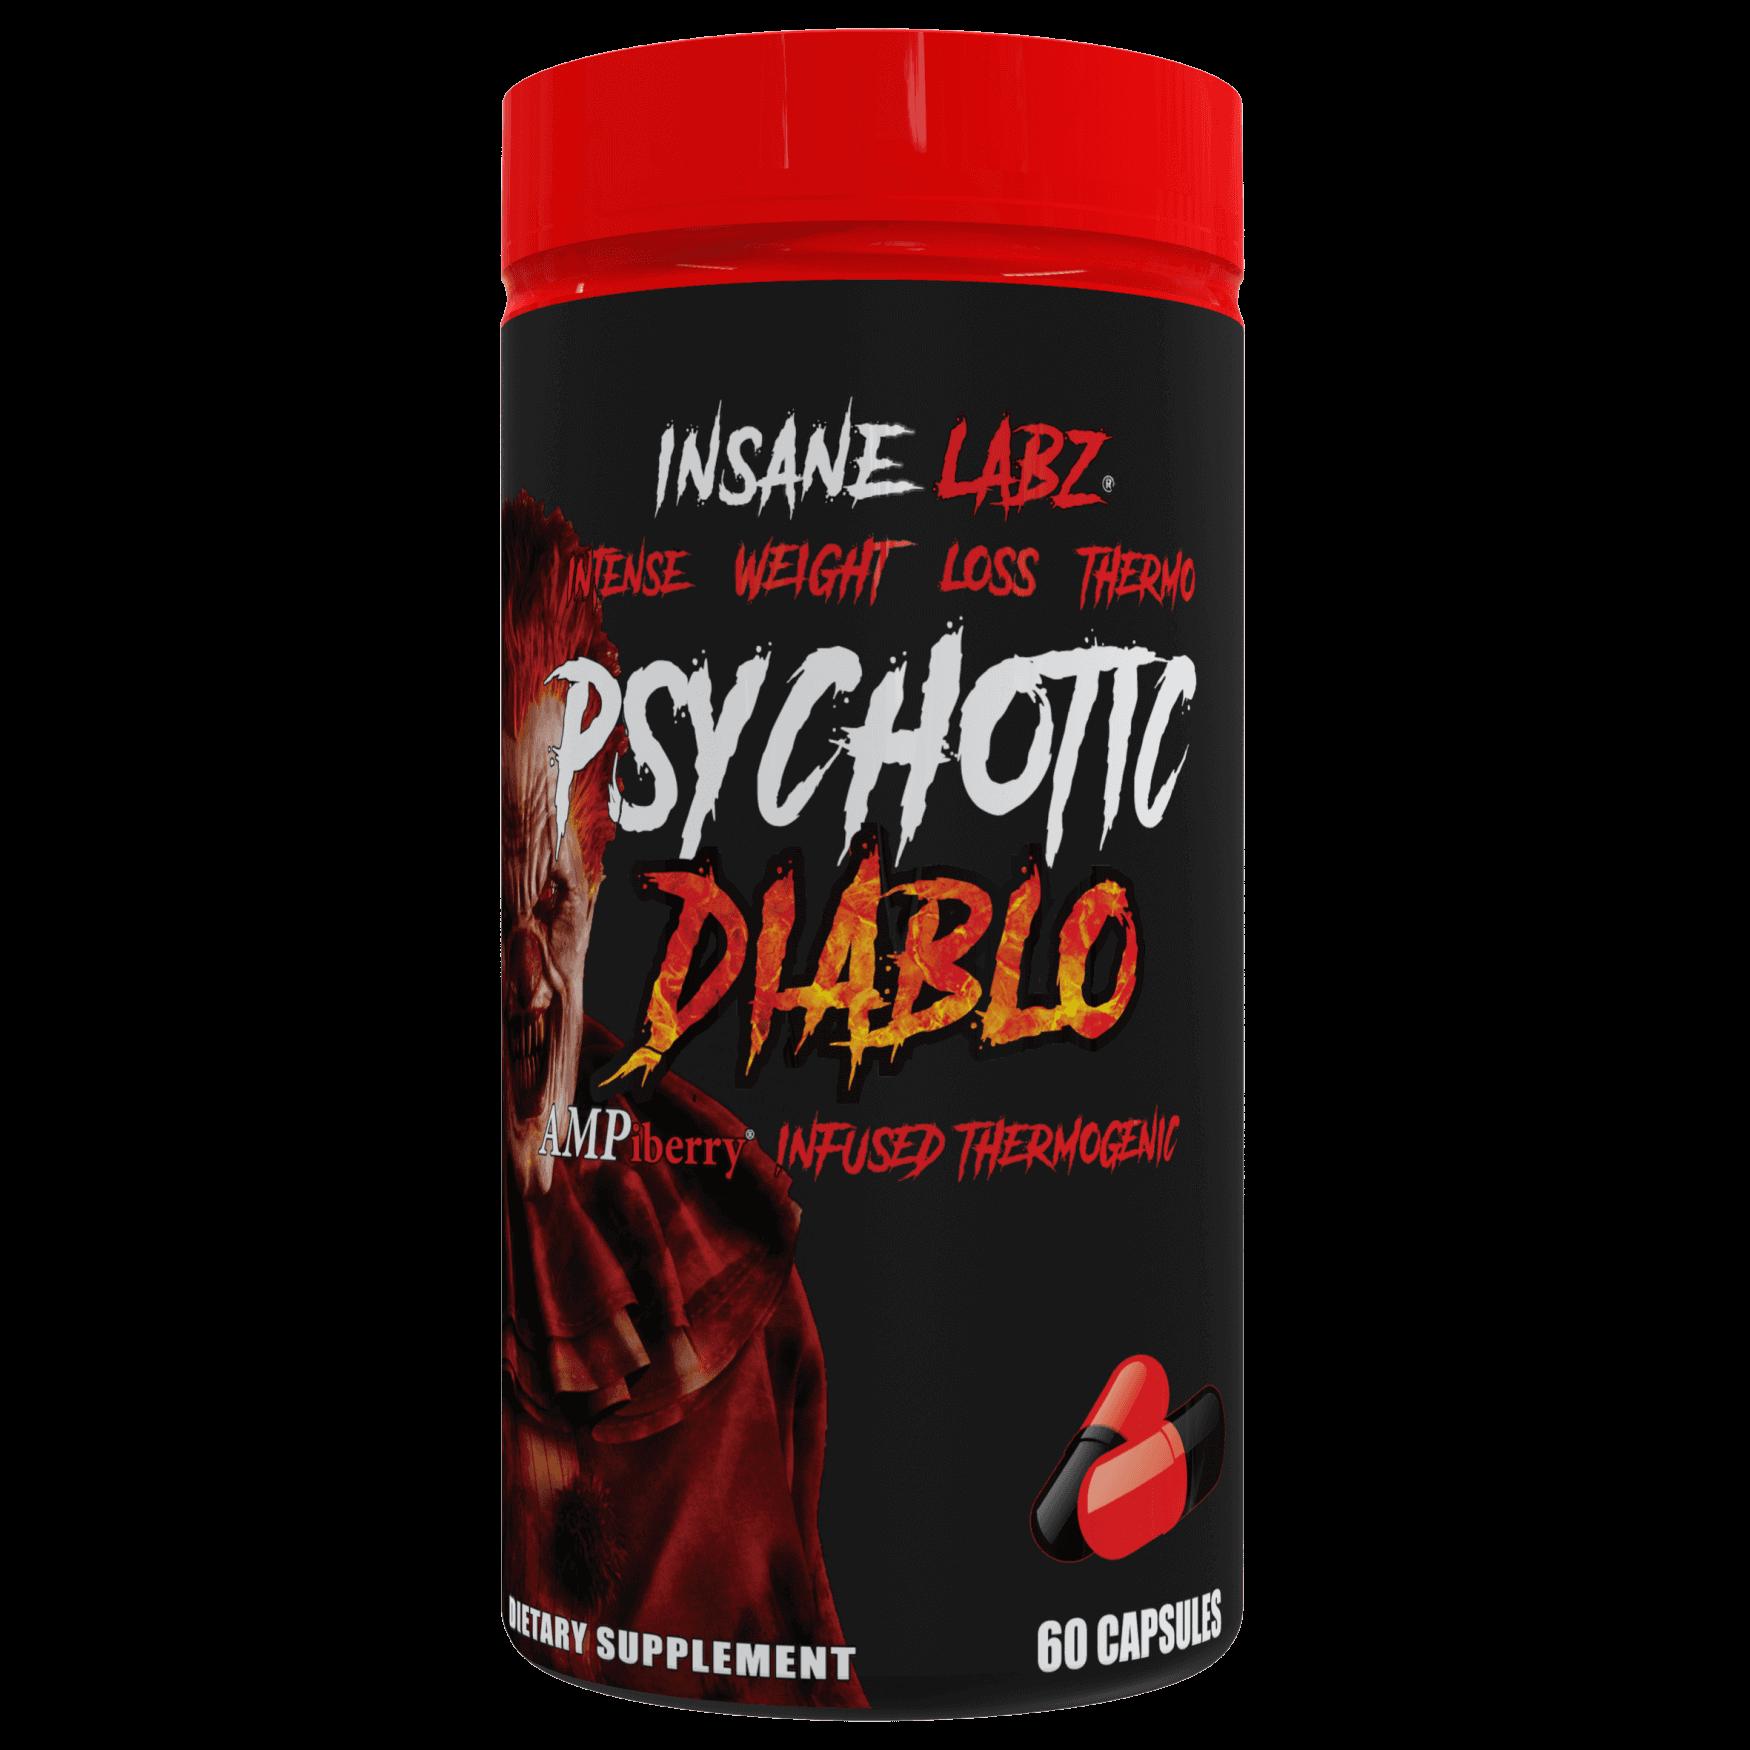 Psychotic Diablo Fat Burner, Insane Labz, 60 capsule